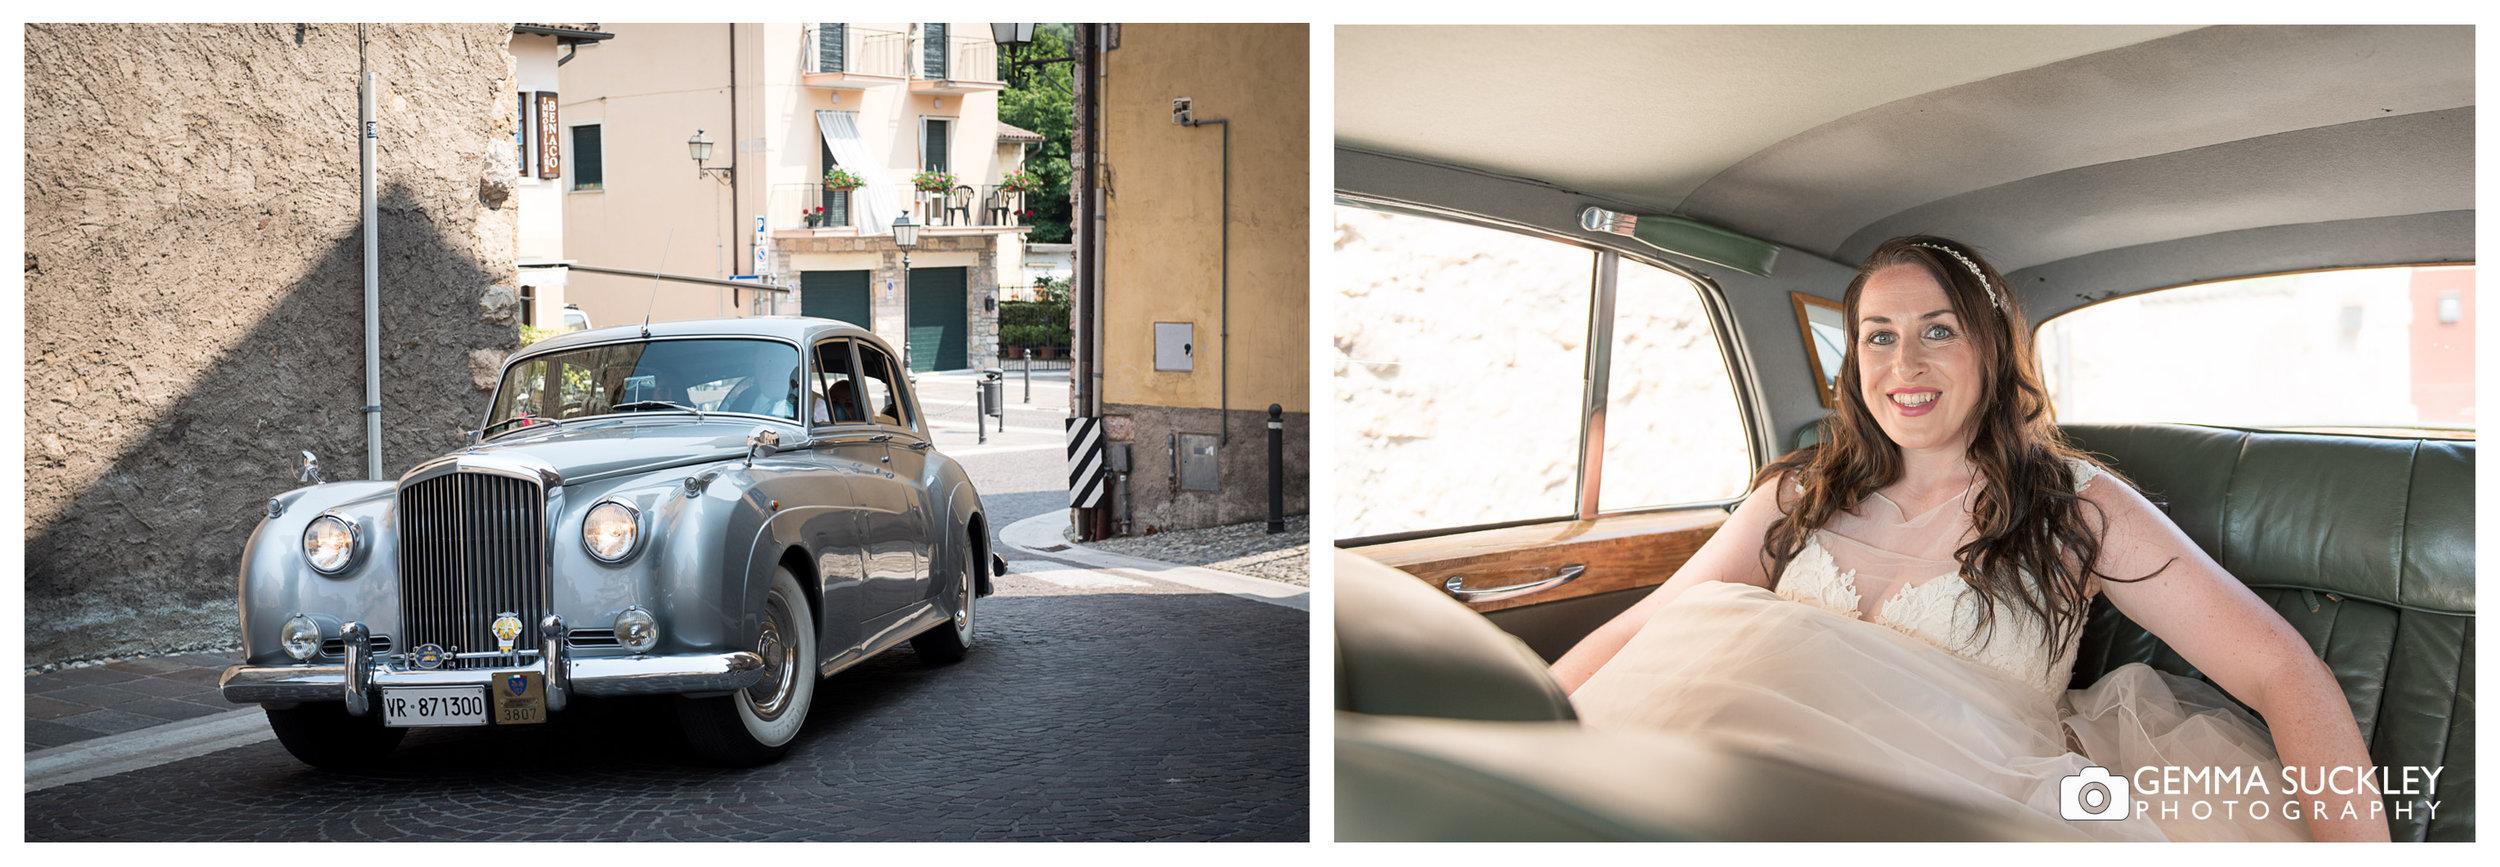 bride arriving in the wedding car in Lake Garda